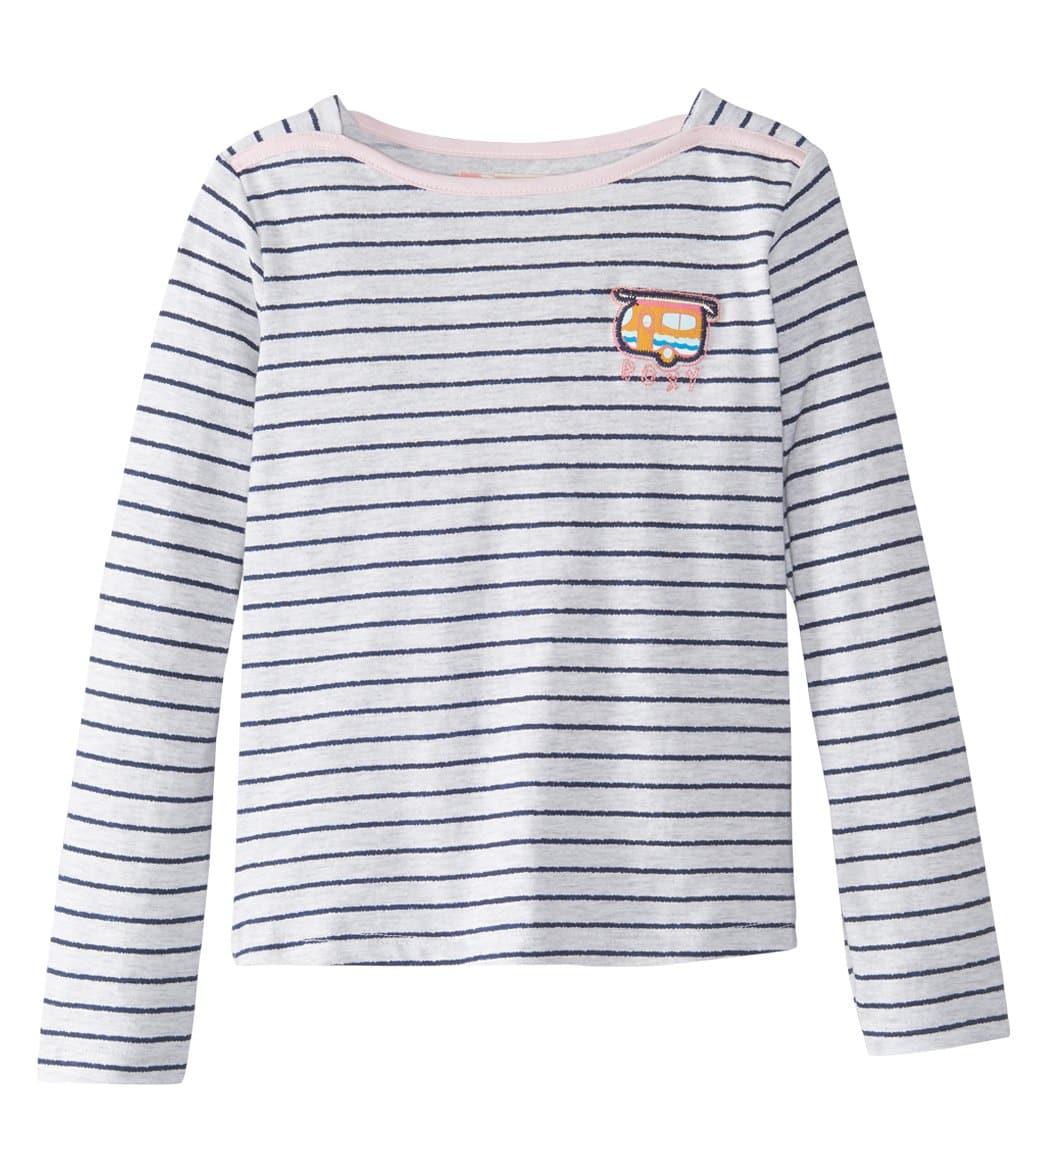 Roxy Girls' Scat Singing Tee Shirt 2T-7 - Metro Heather Wavy Stripe 6 Cotton - Swimoutlet.com